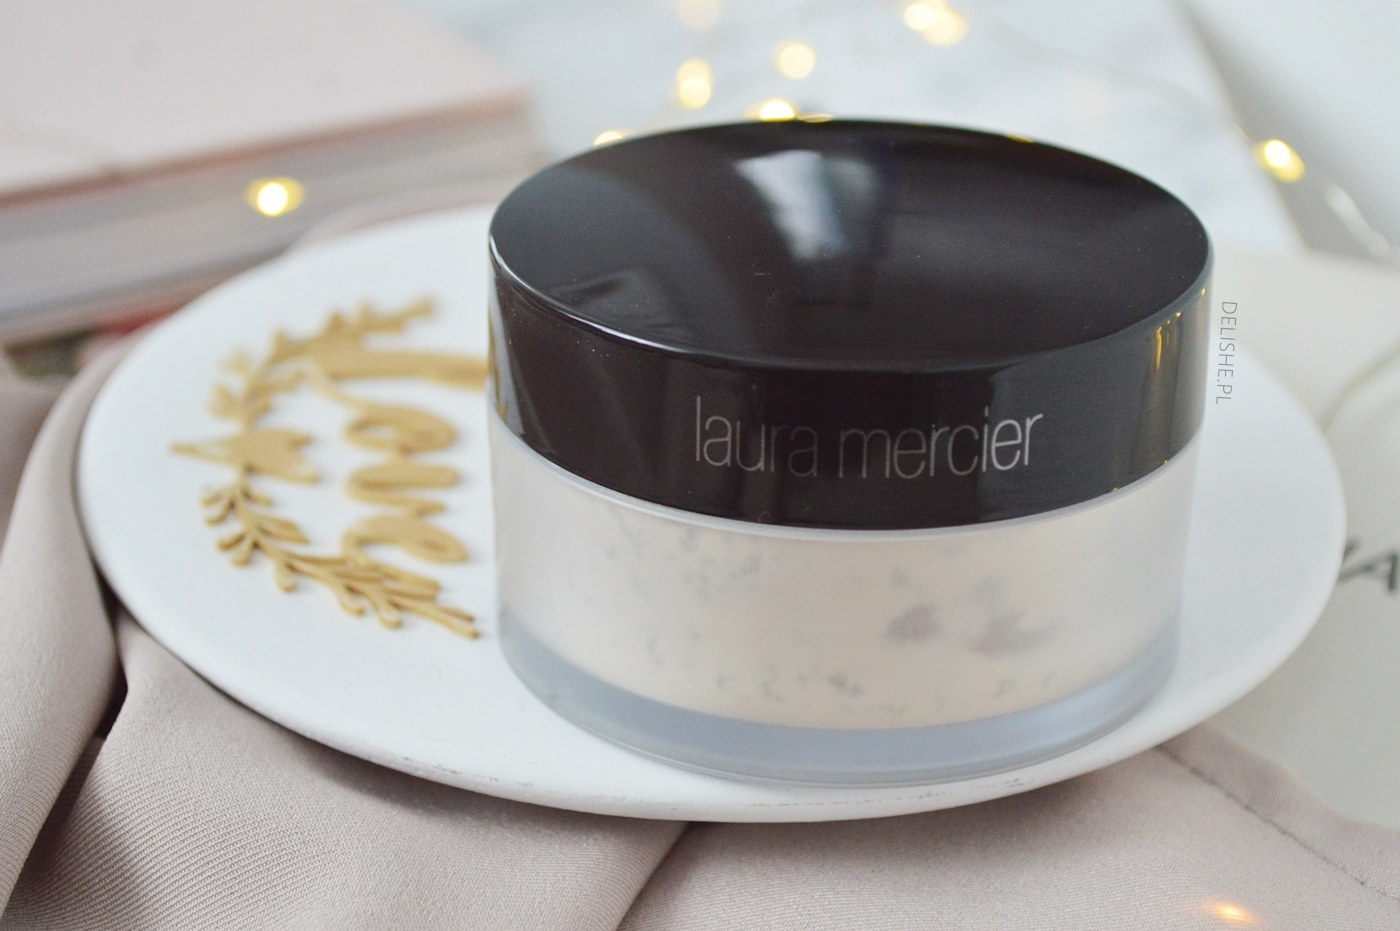 puder laura mercier translucent powder czy warto kupić